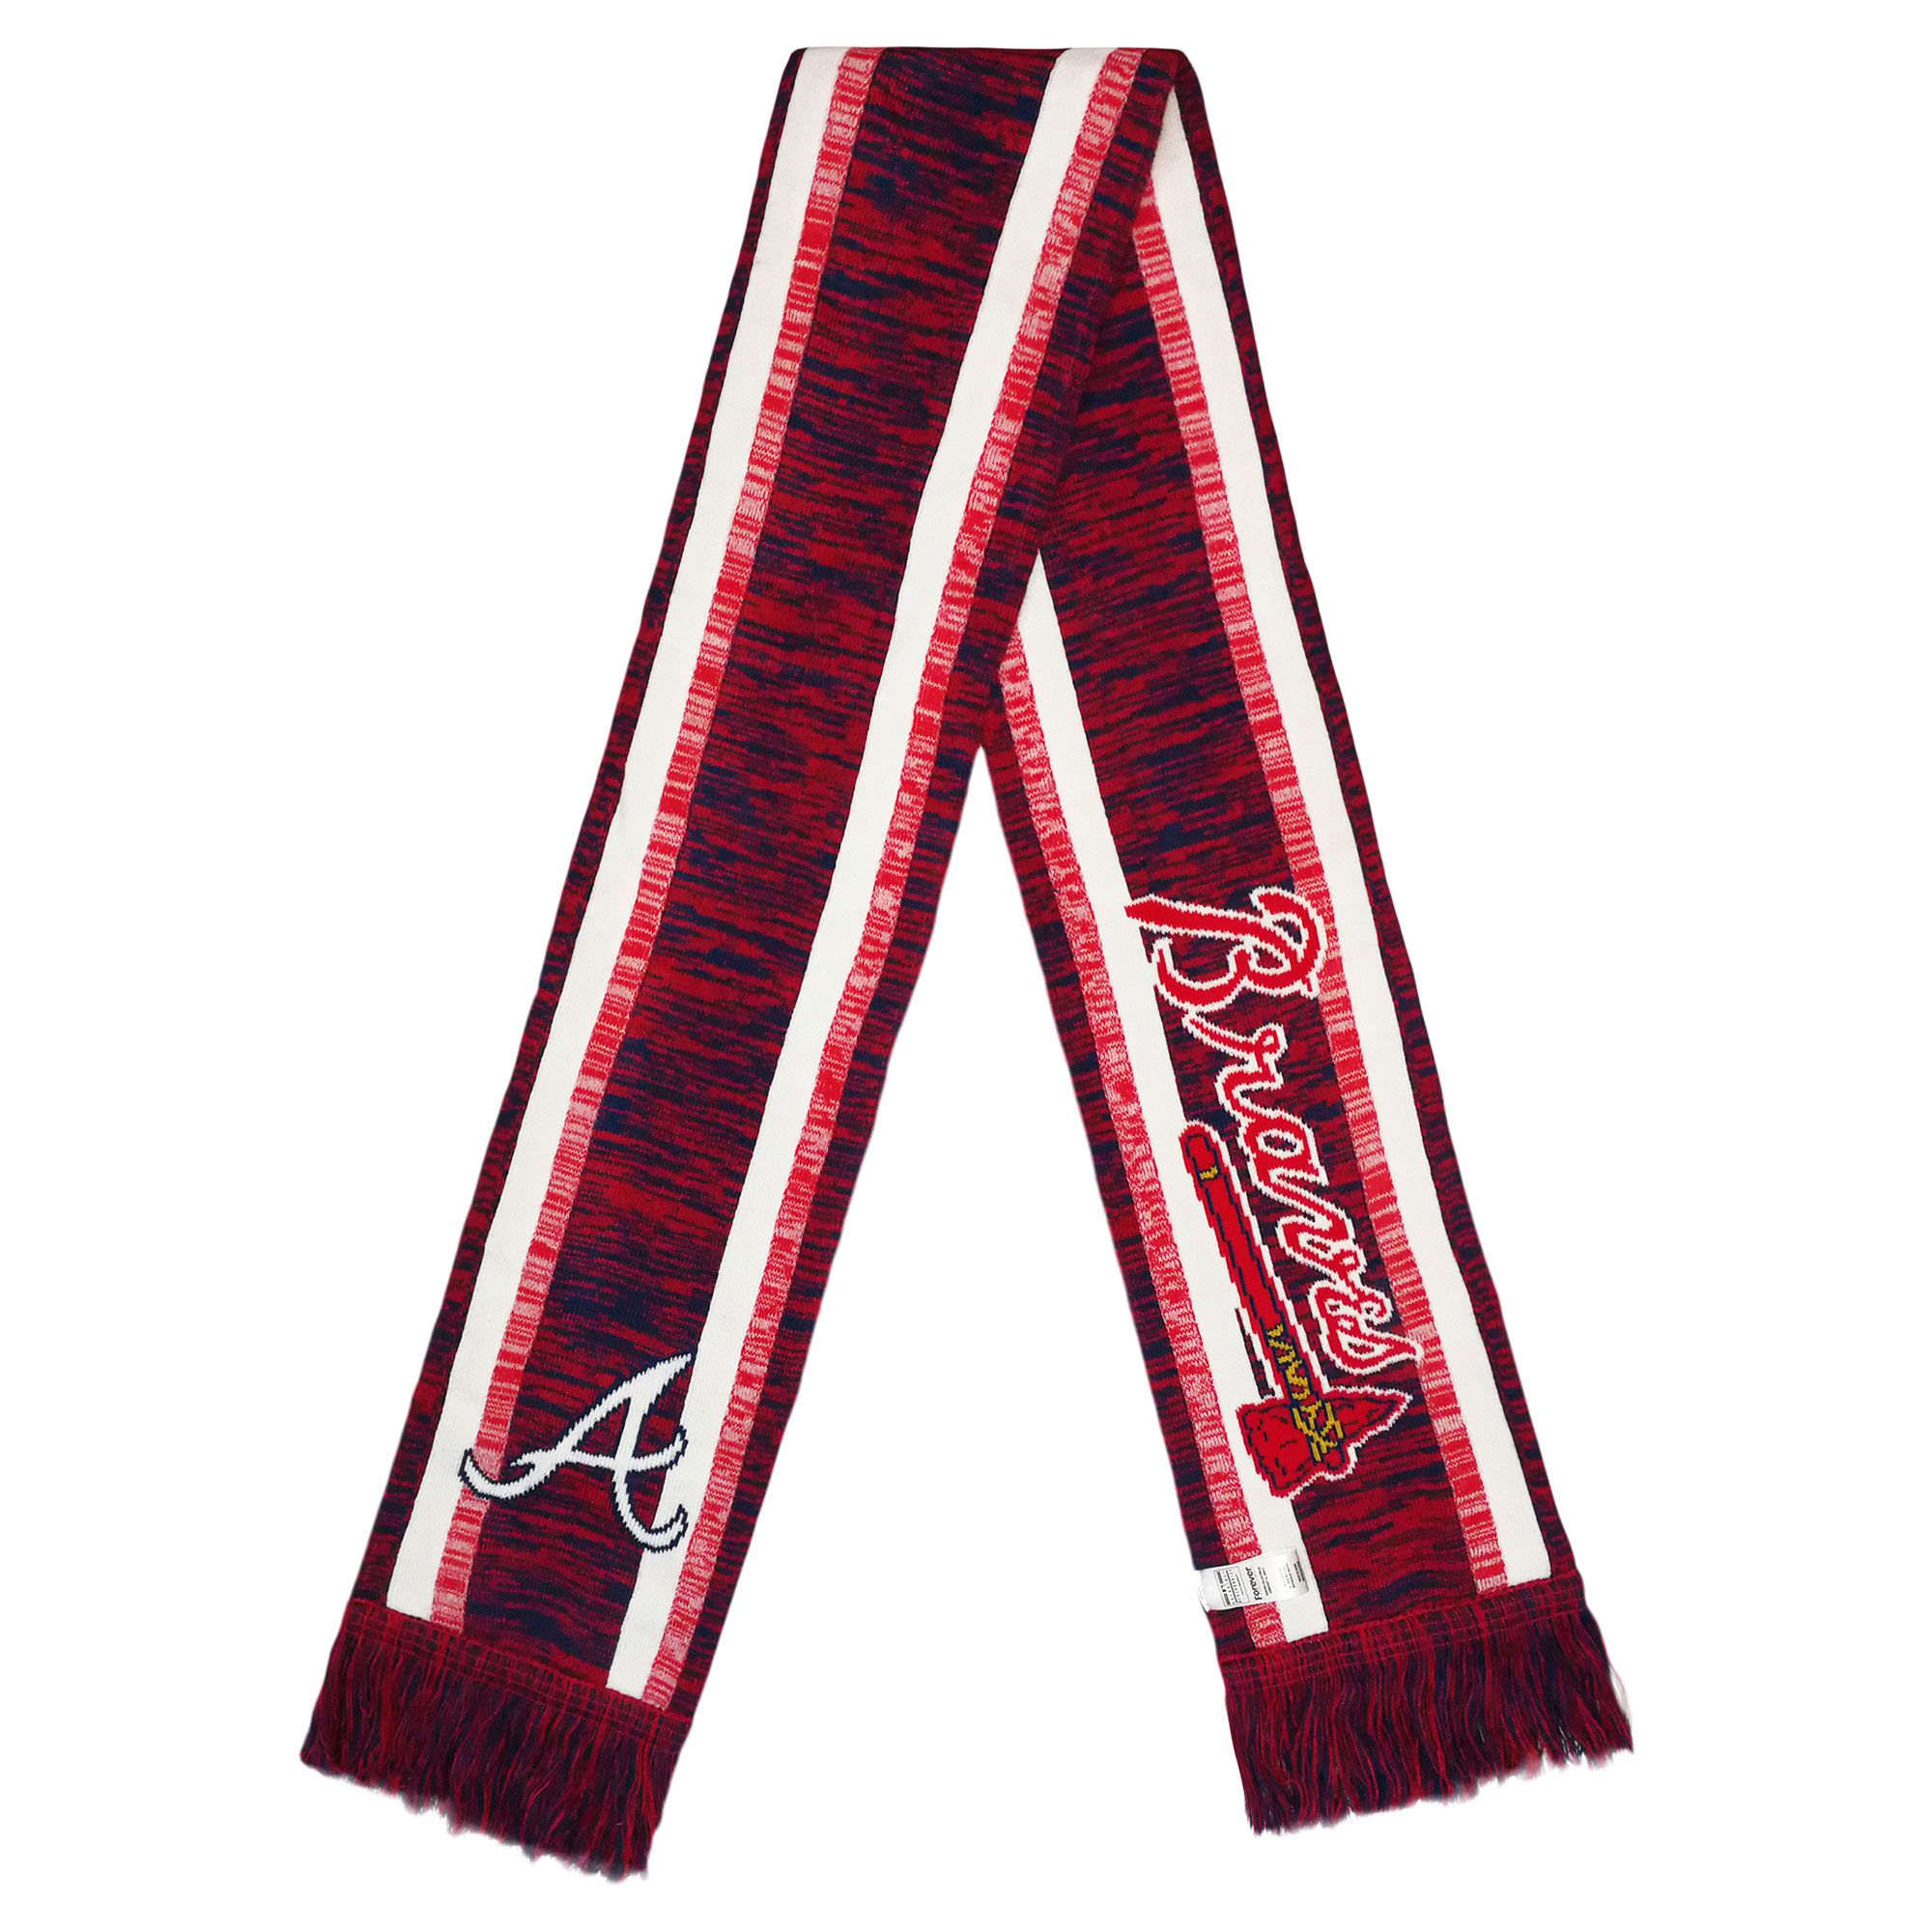 Atlanta Braves Knit Color Blend Scarf - No Size